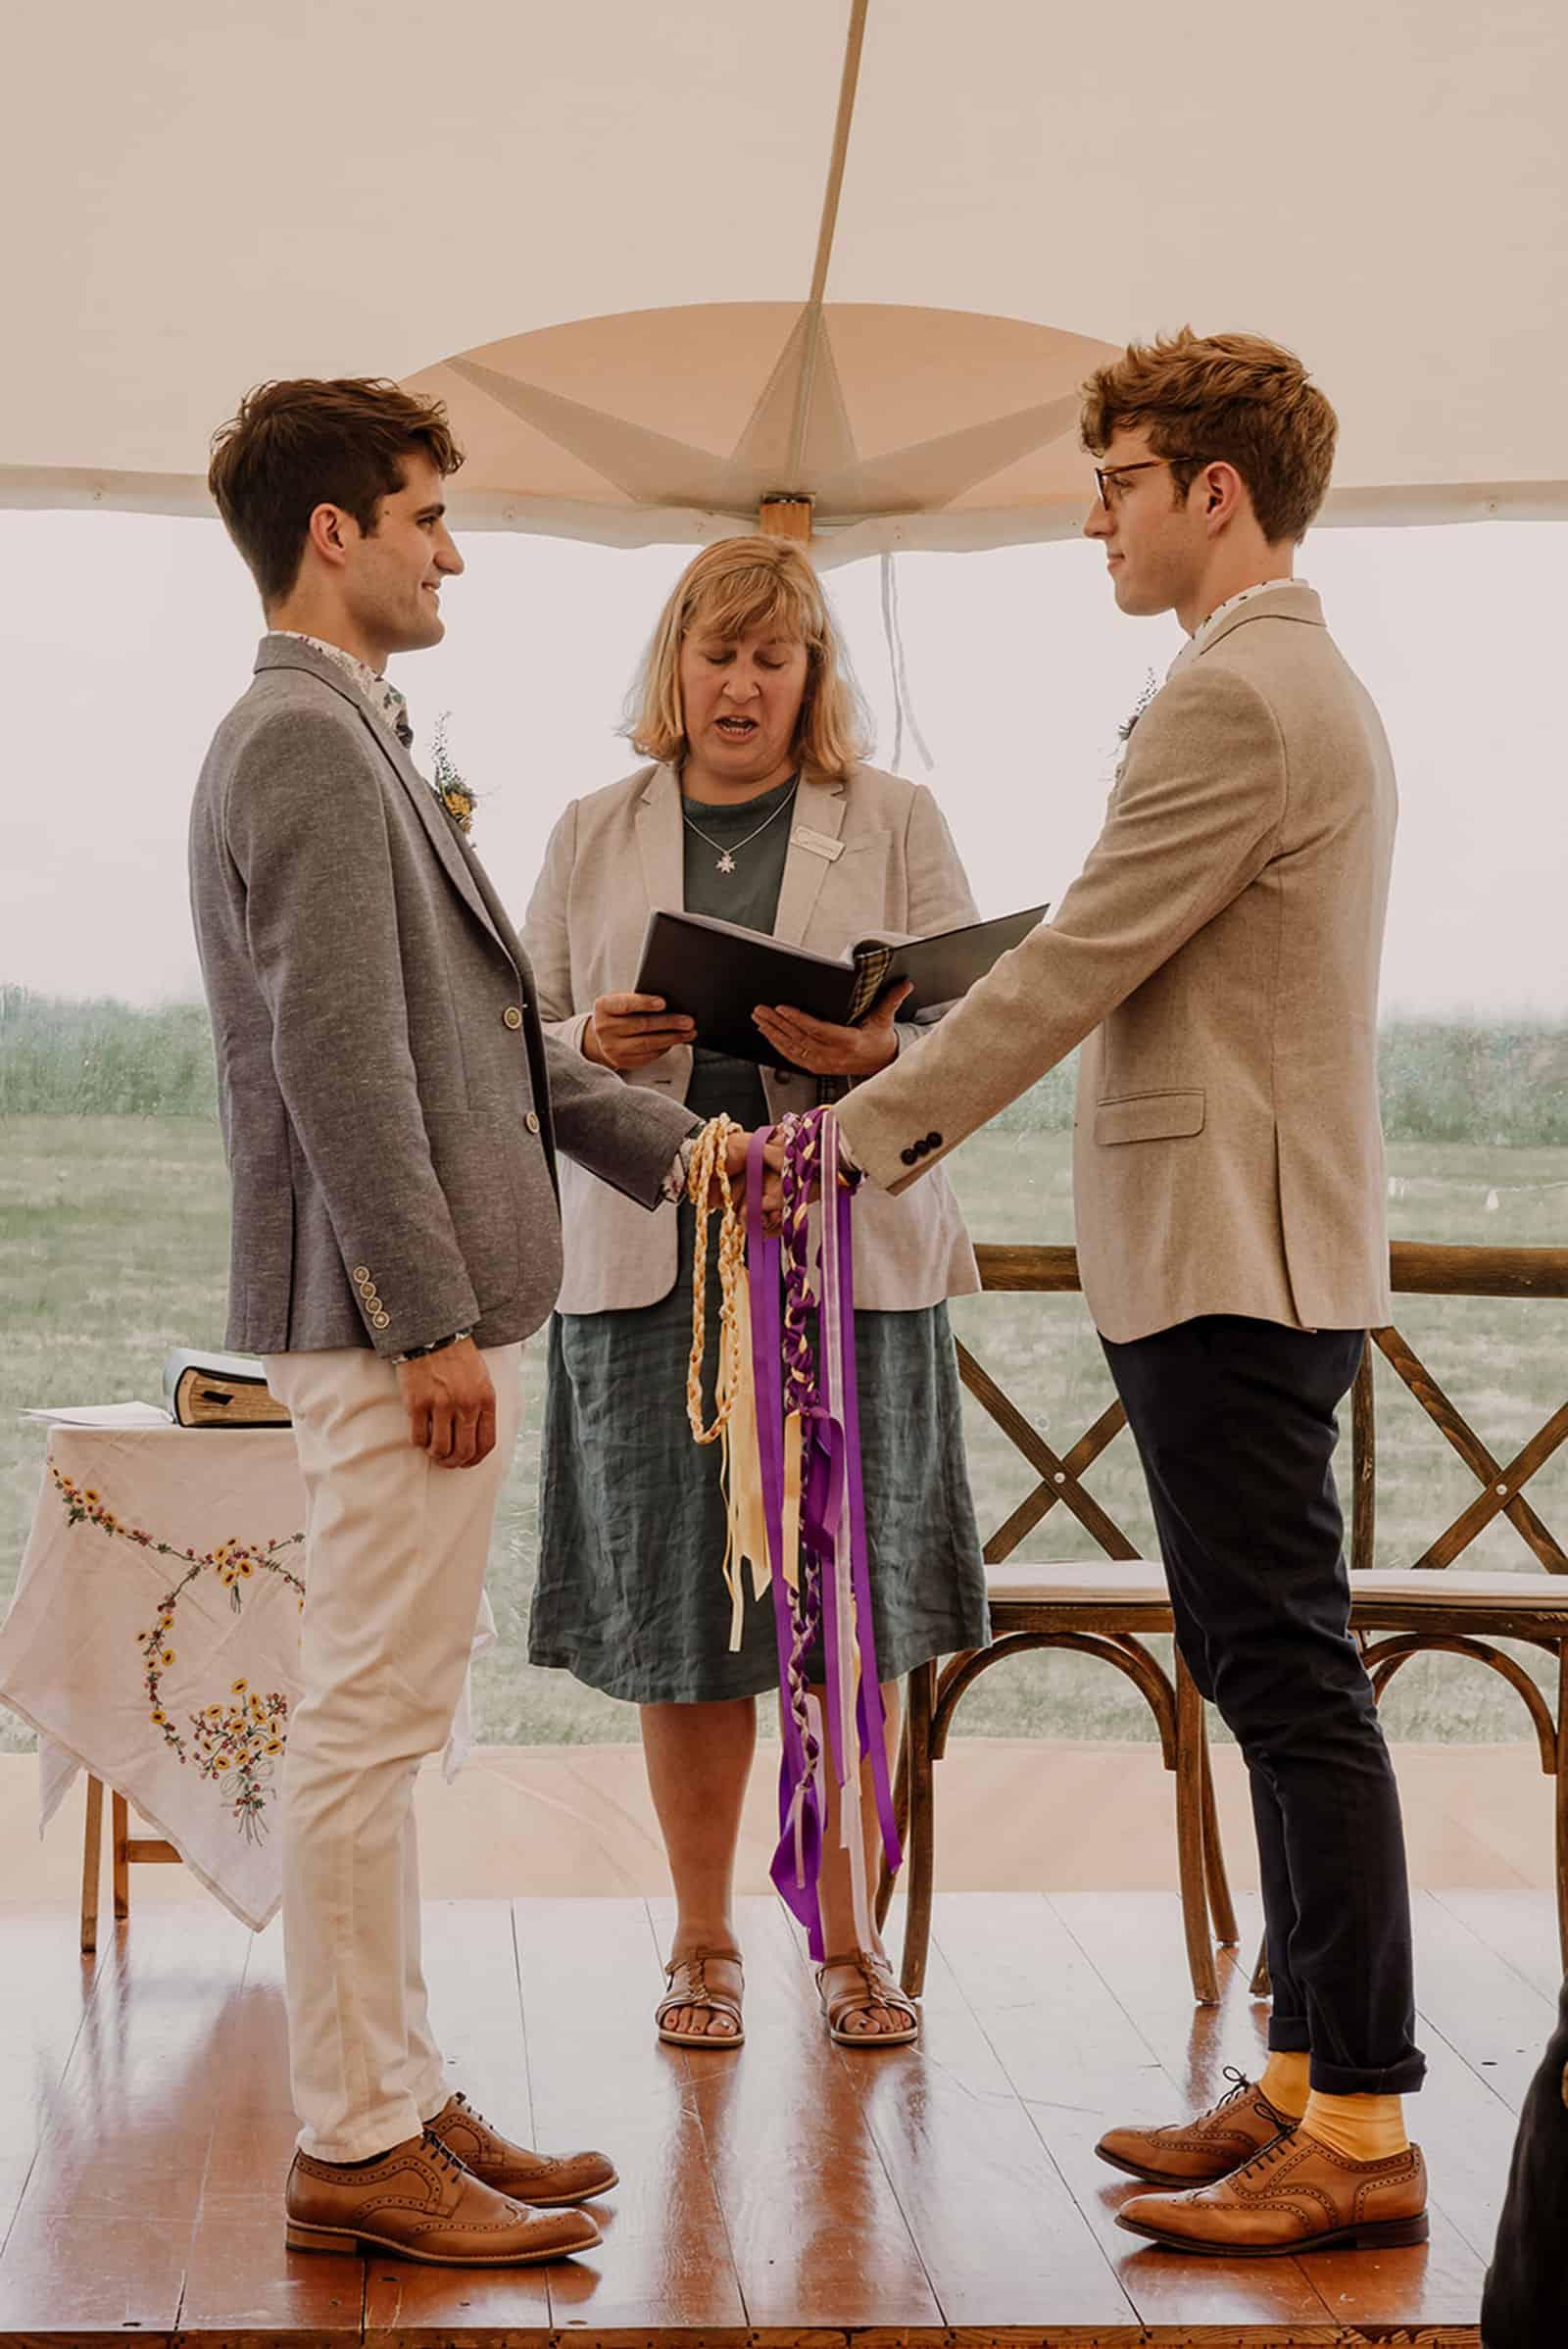 newdowns-farm-wedding-ceremony-cornish-celebrants-tom-peter-0004